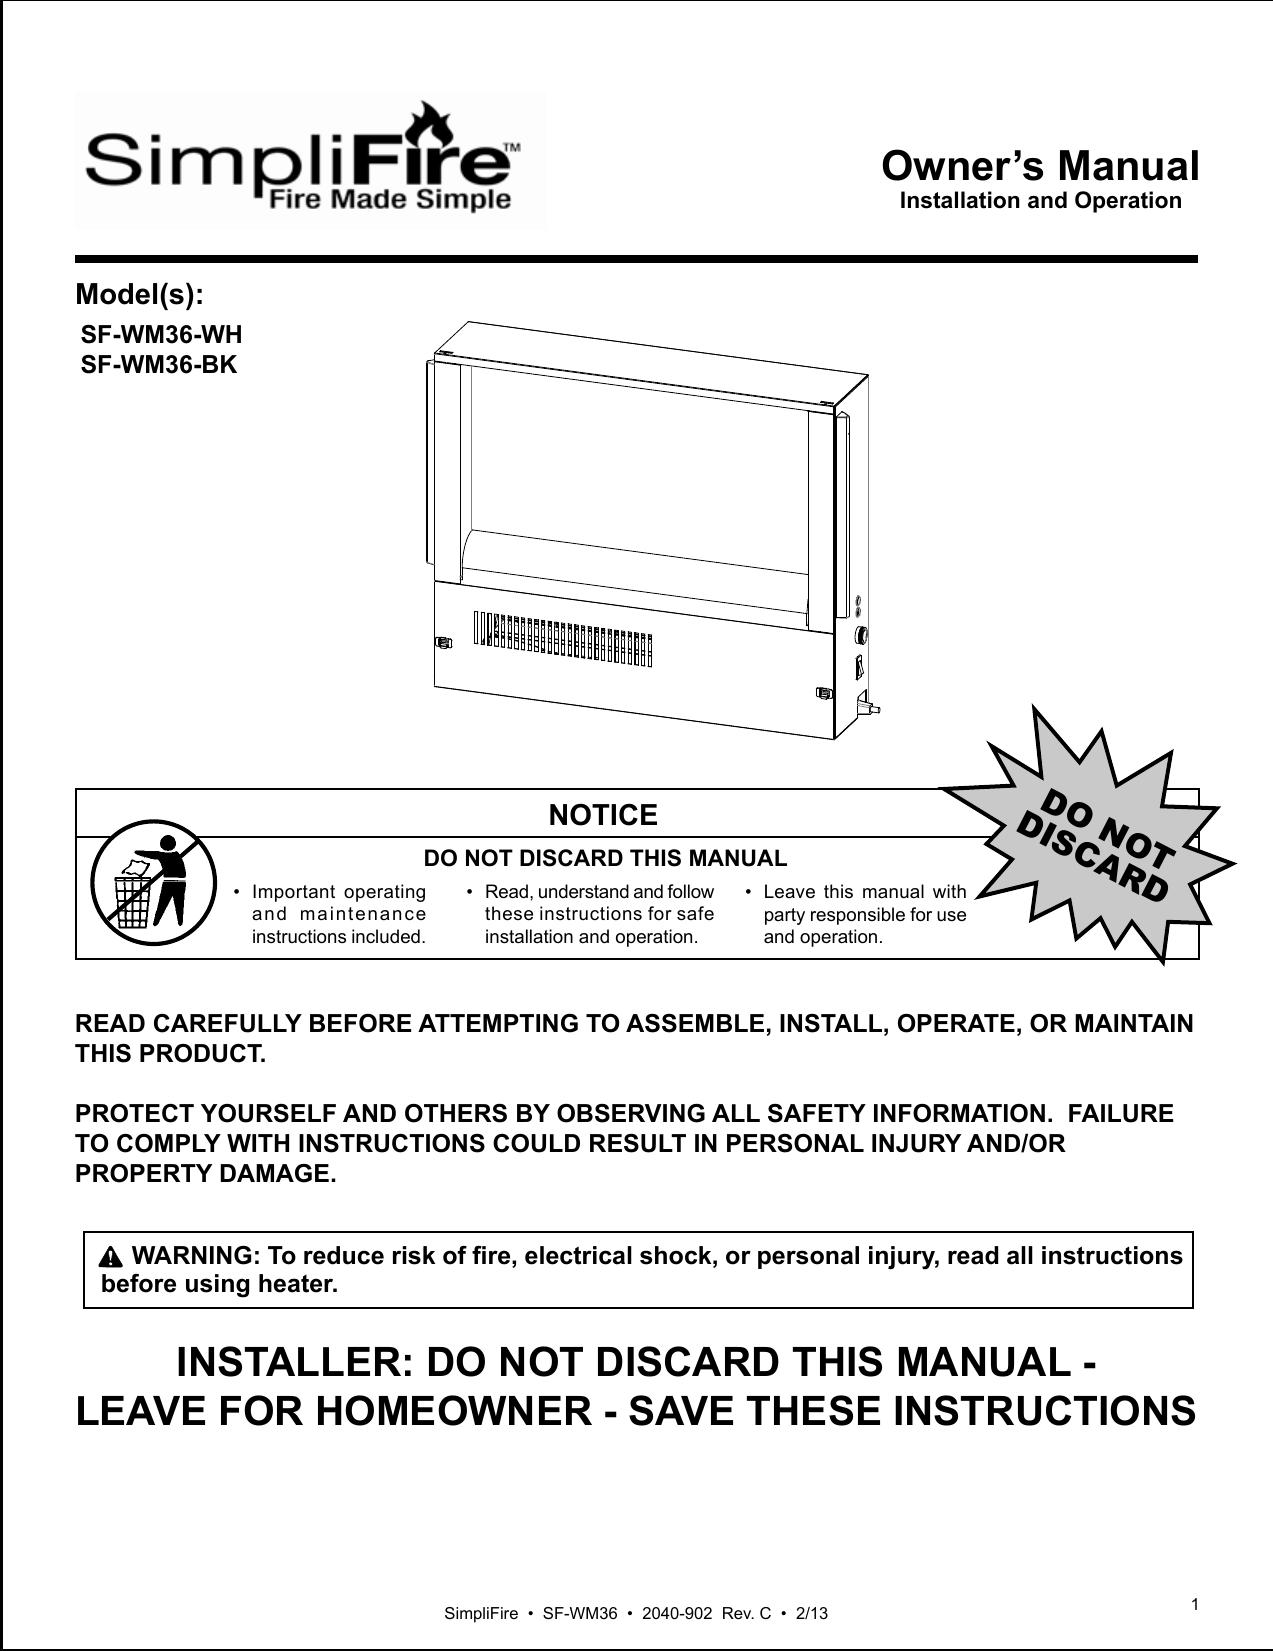 Simplifire Sf Wm36 Wh Owner S Manual Manualzz